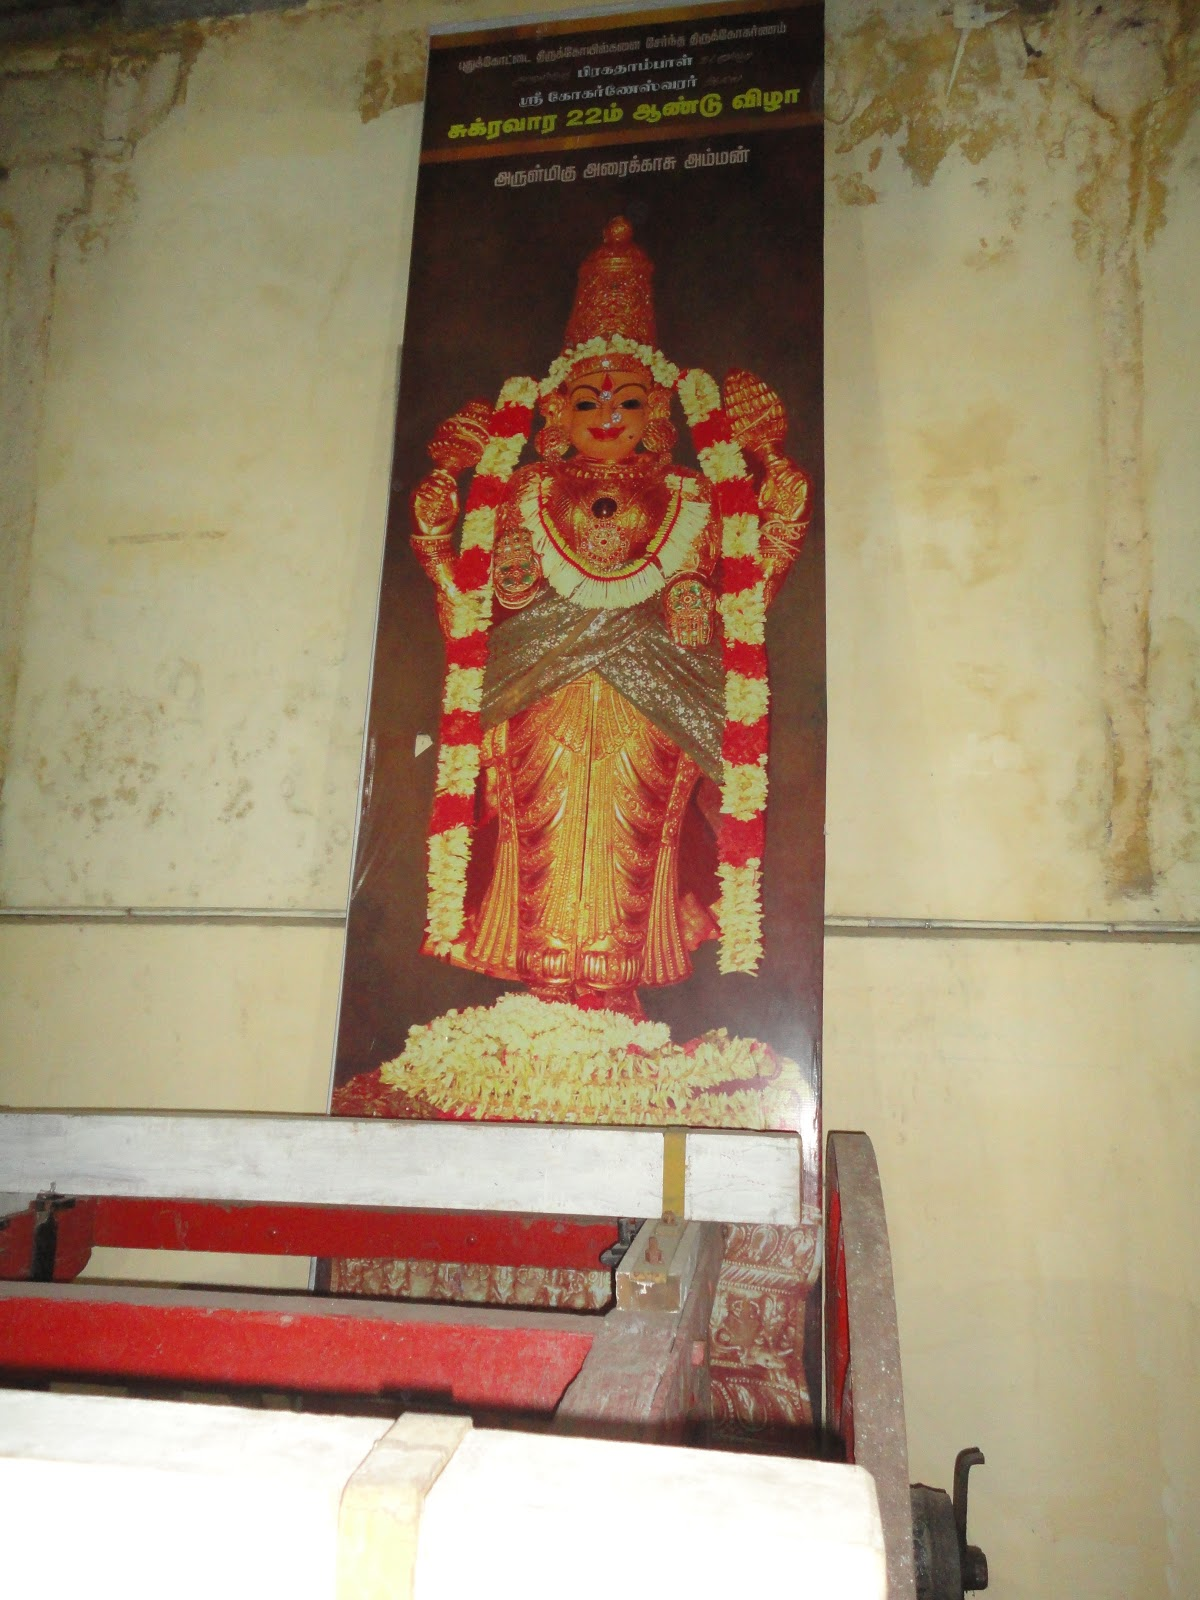 Temple Dedicated to Guru Bhagavan-Omampuliyur-Pushpalathambigai